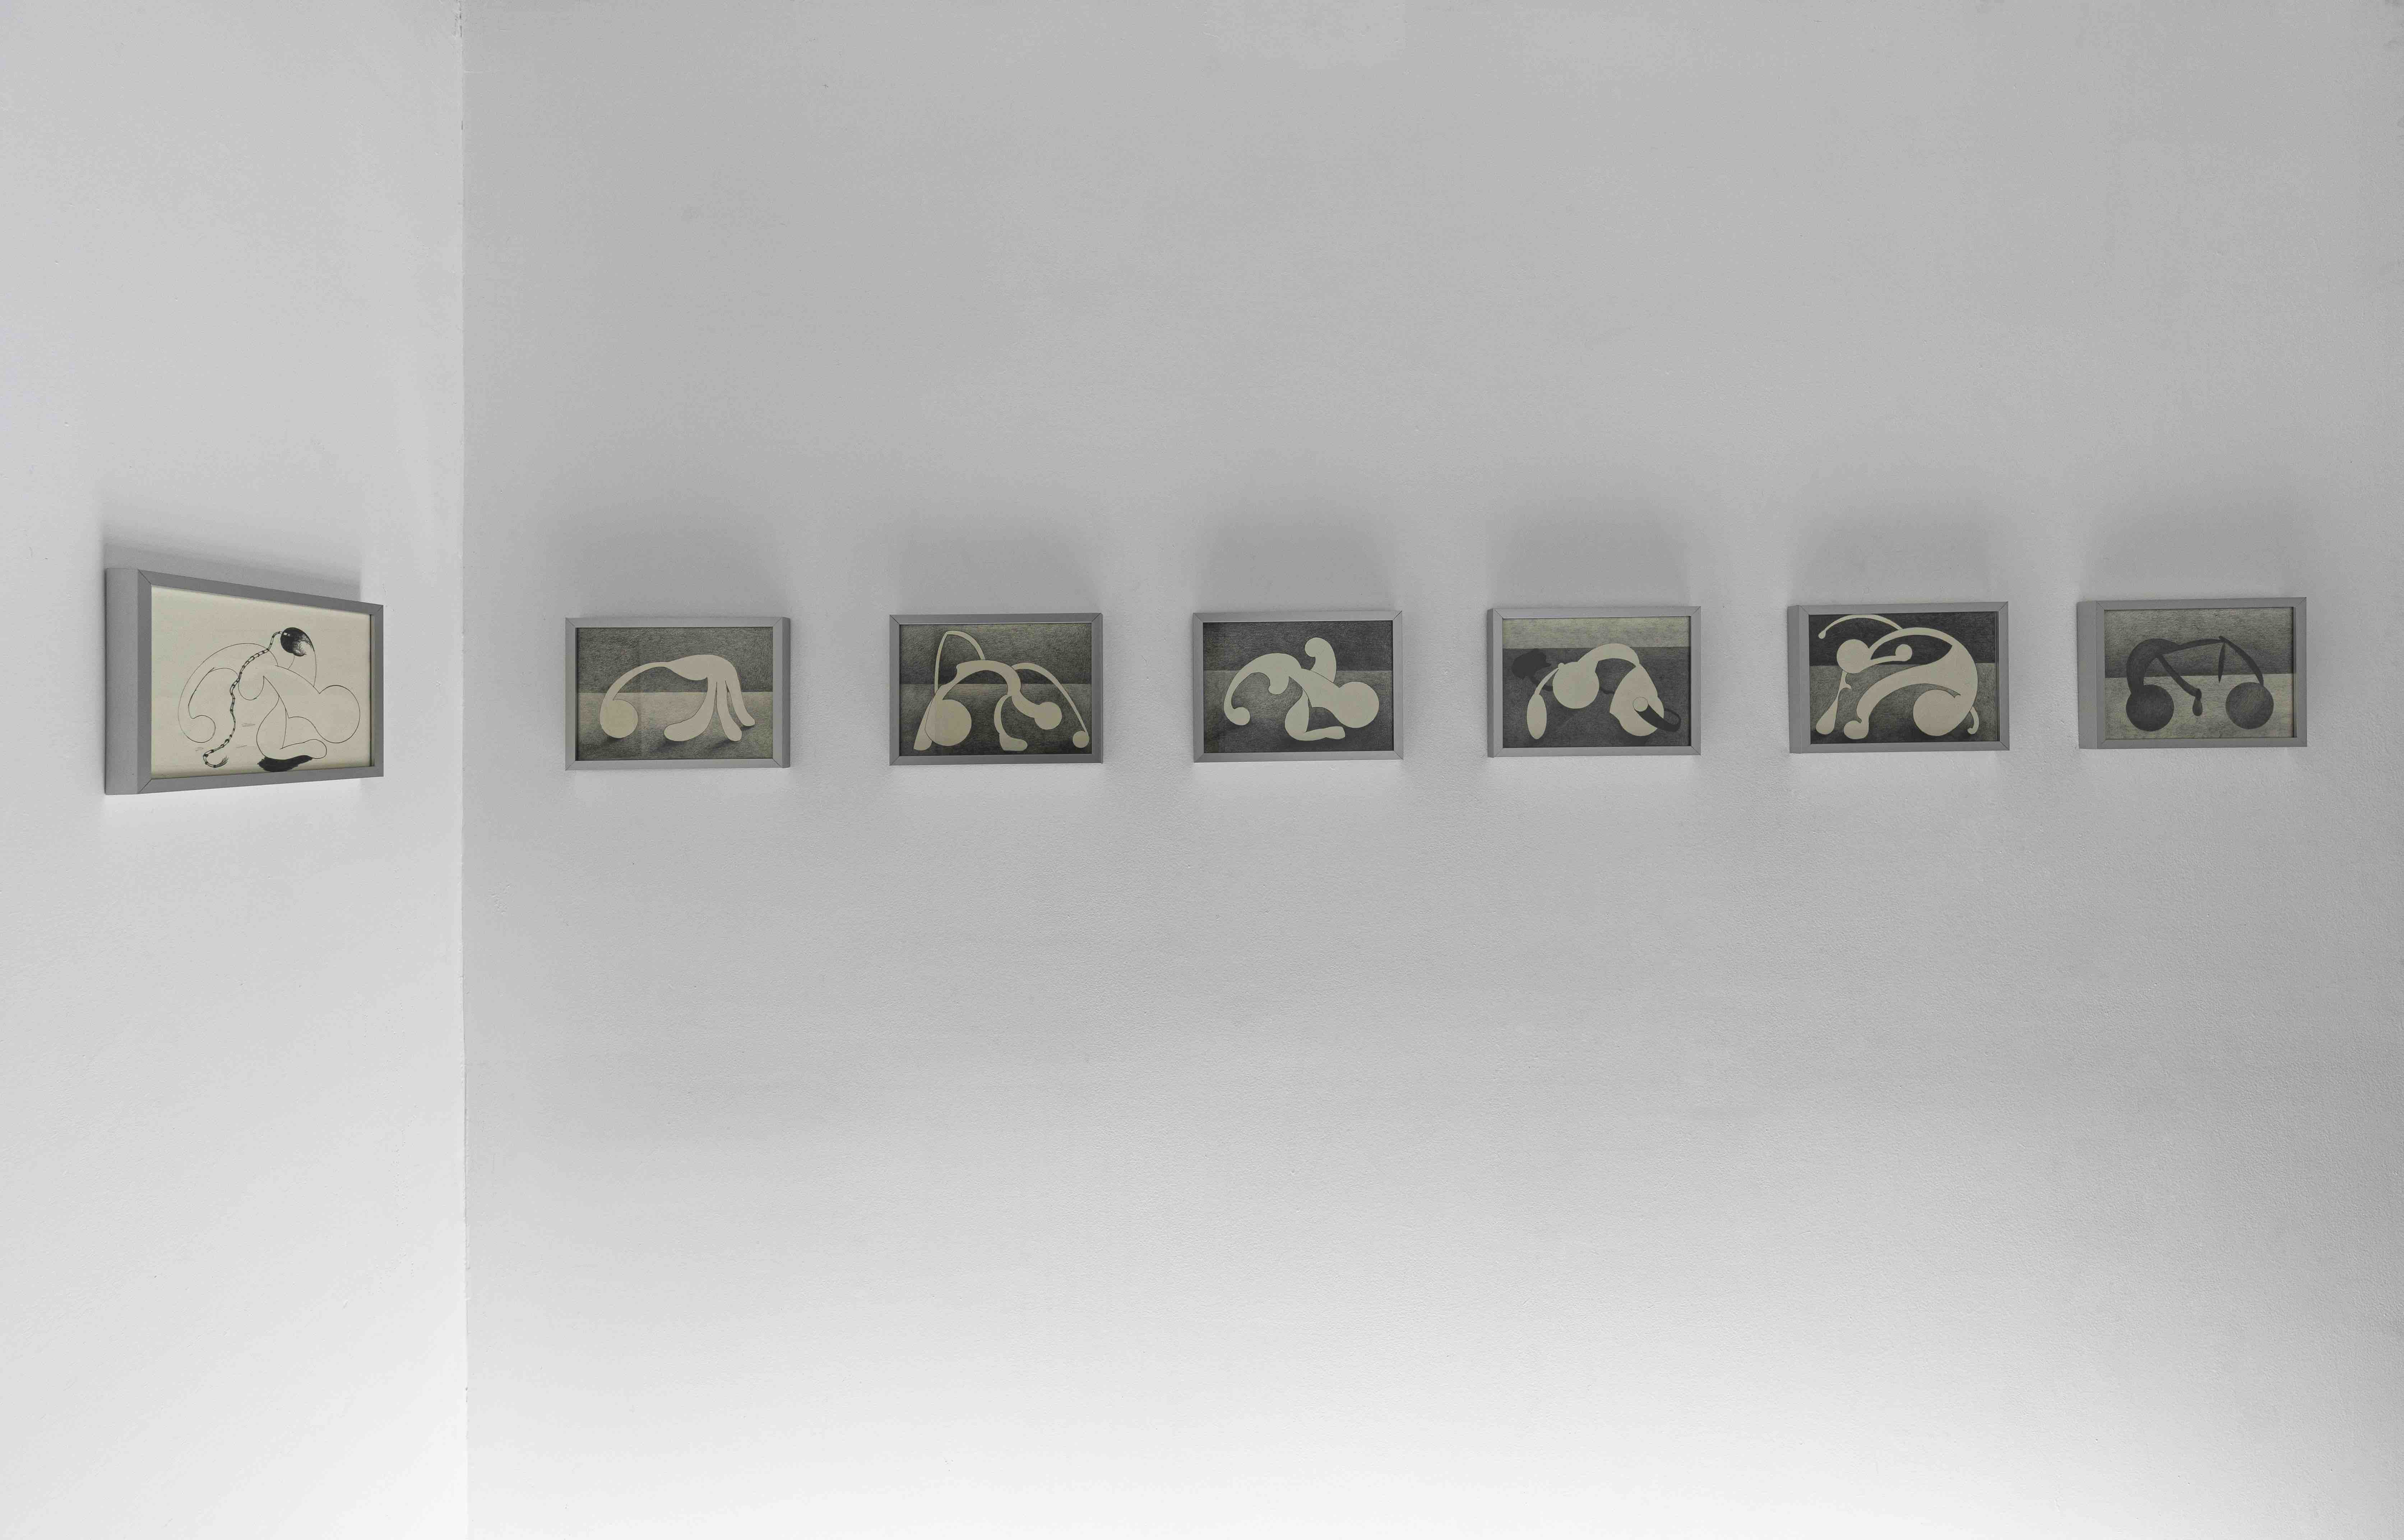 Installation view of Que el día se convierta en noche, Milagros Rojas, Salón Silicón, 2021. Photo: Jordán Rodríguez. Courtesy of the artist and Salón Silicon